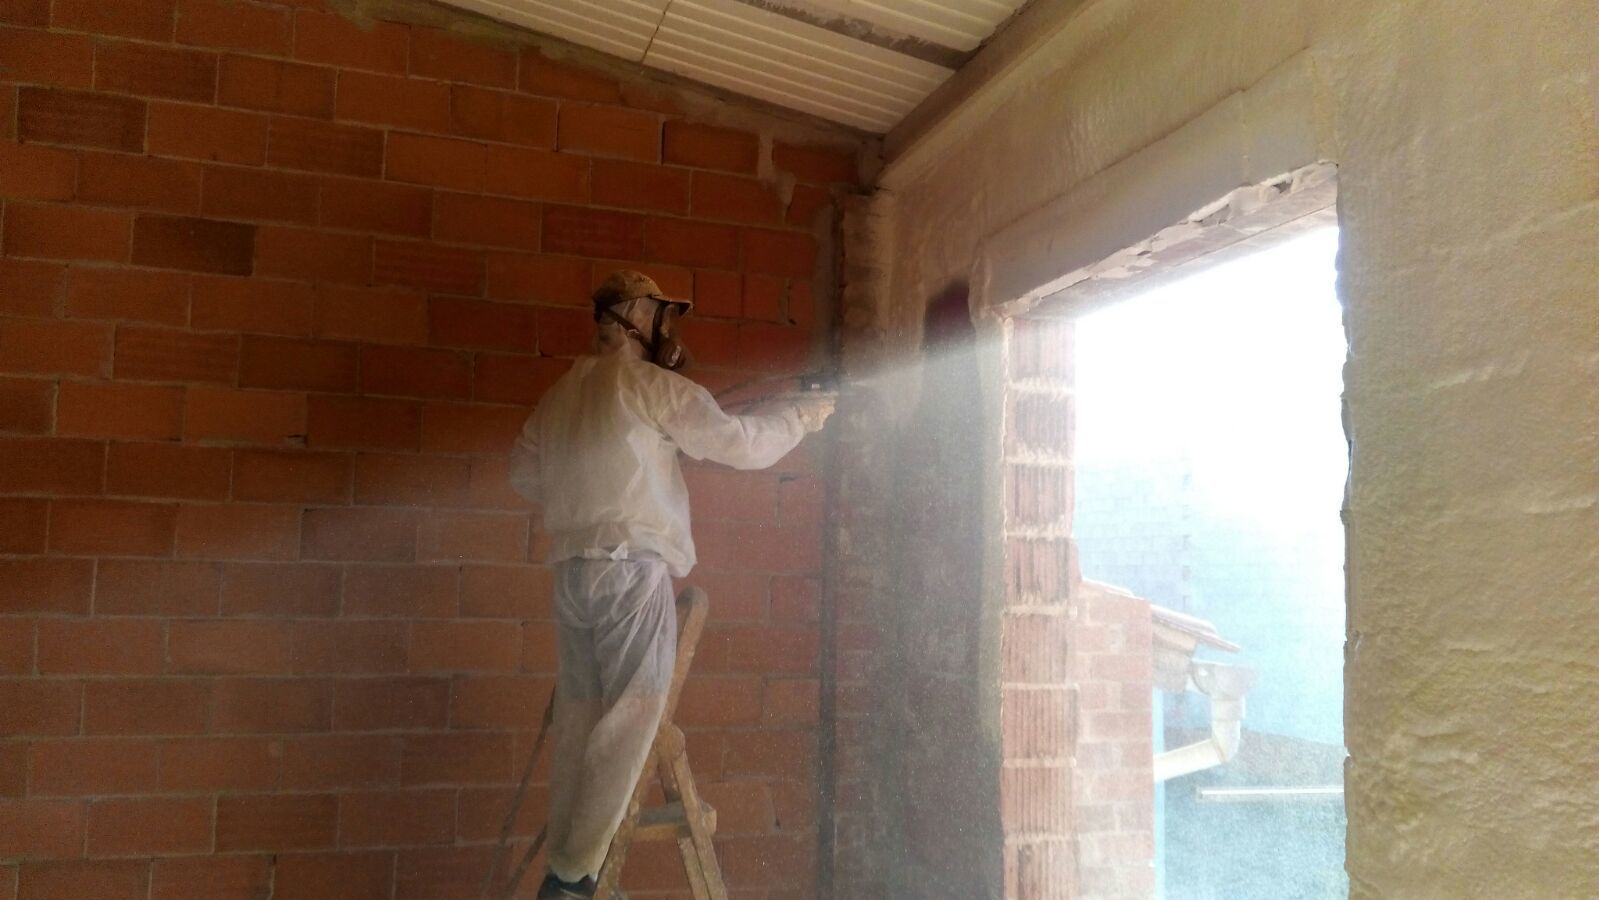 Foto 48 de Aislamientos acústicos y térmicos en Rafelcofer | Aislamientos de Poliuretano Jaime Femenia